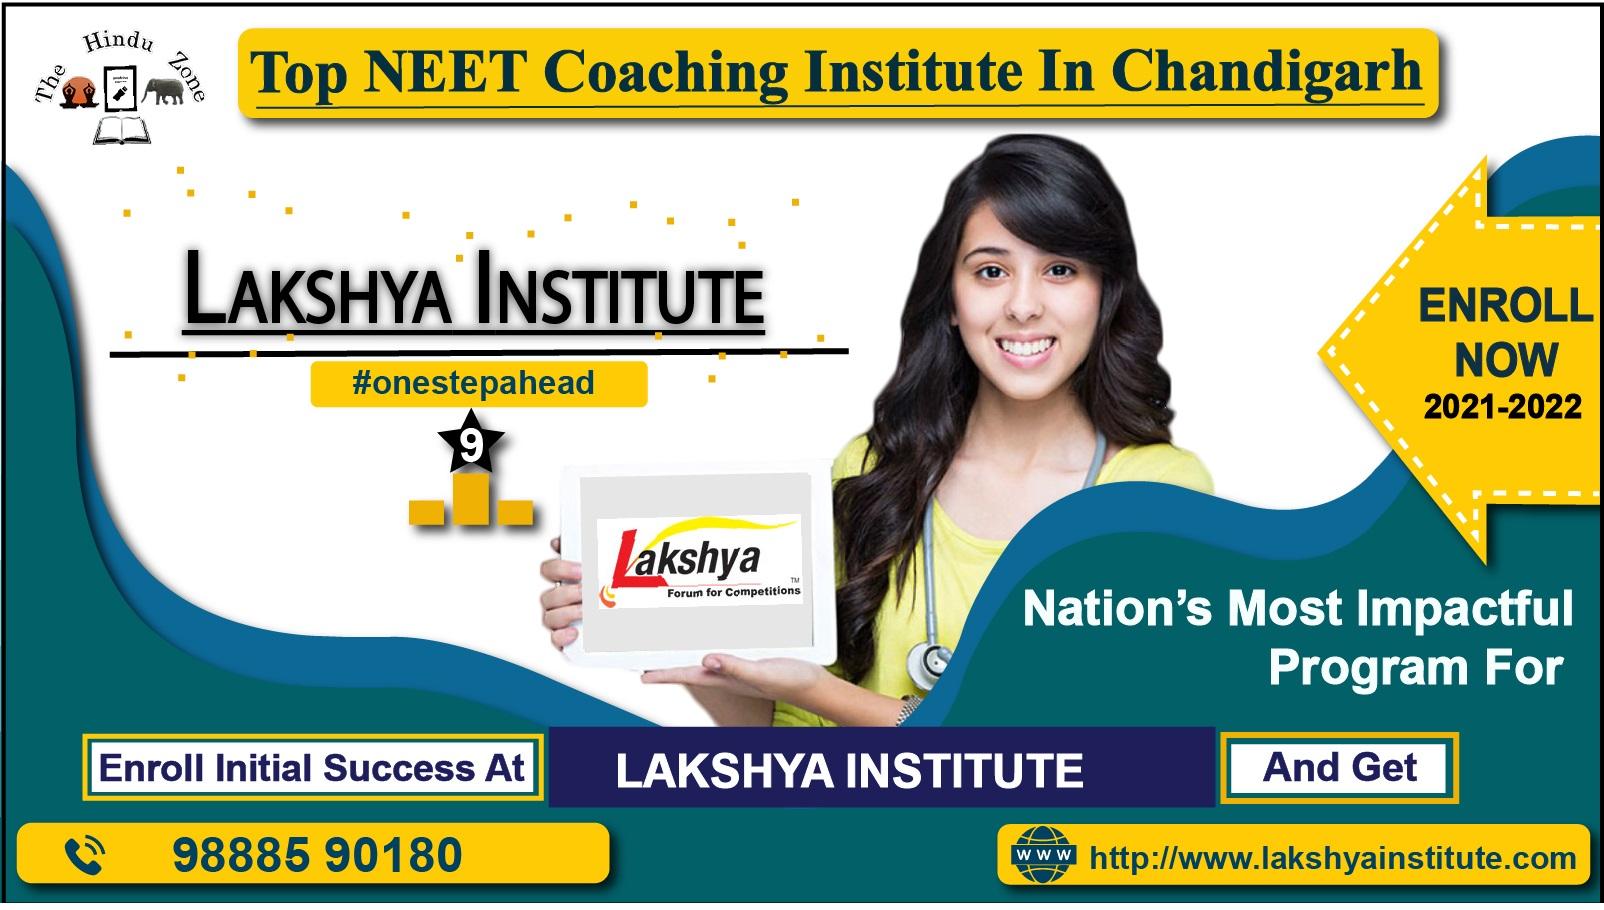 Best Coaching Institute In Chandigarh For NEET